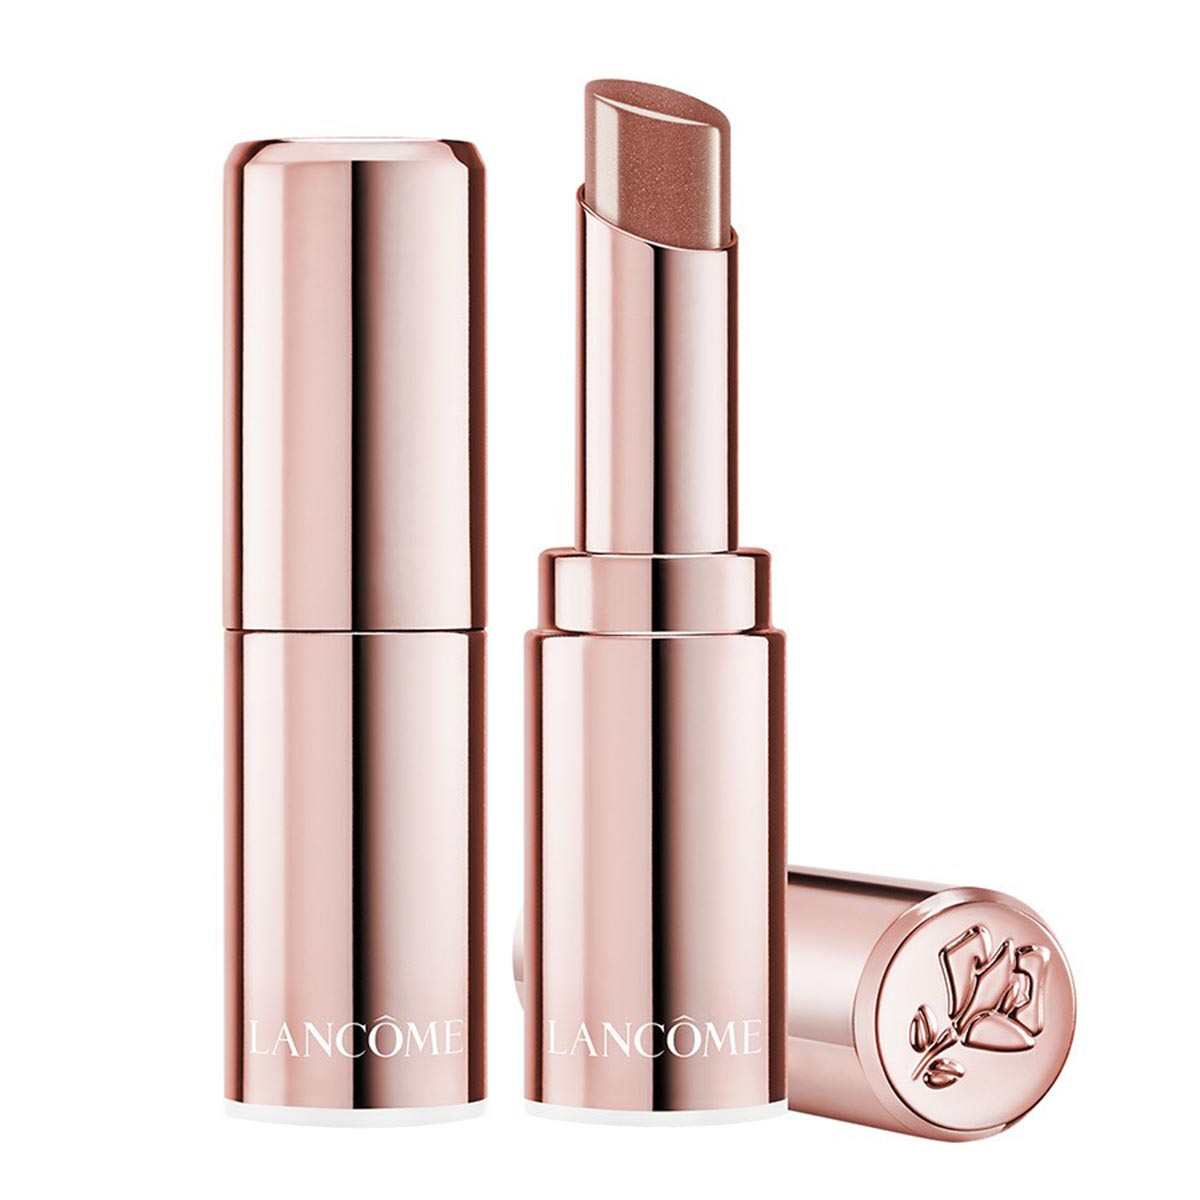 Lancome l absolu mademoiselle shine lipstick 232 watch me shine